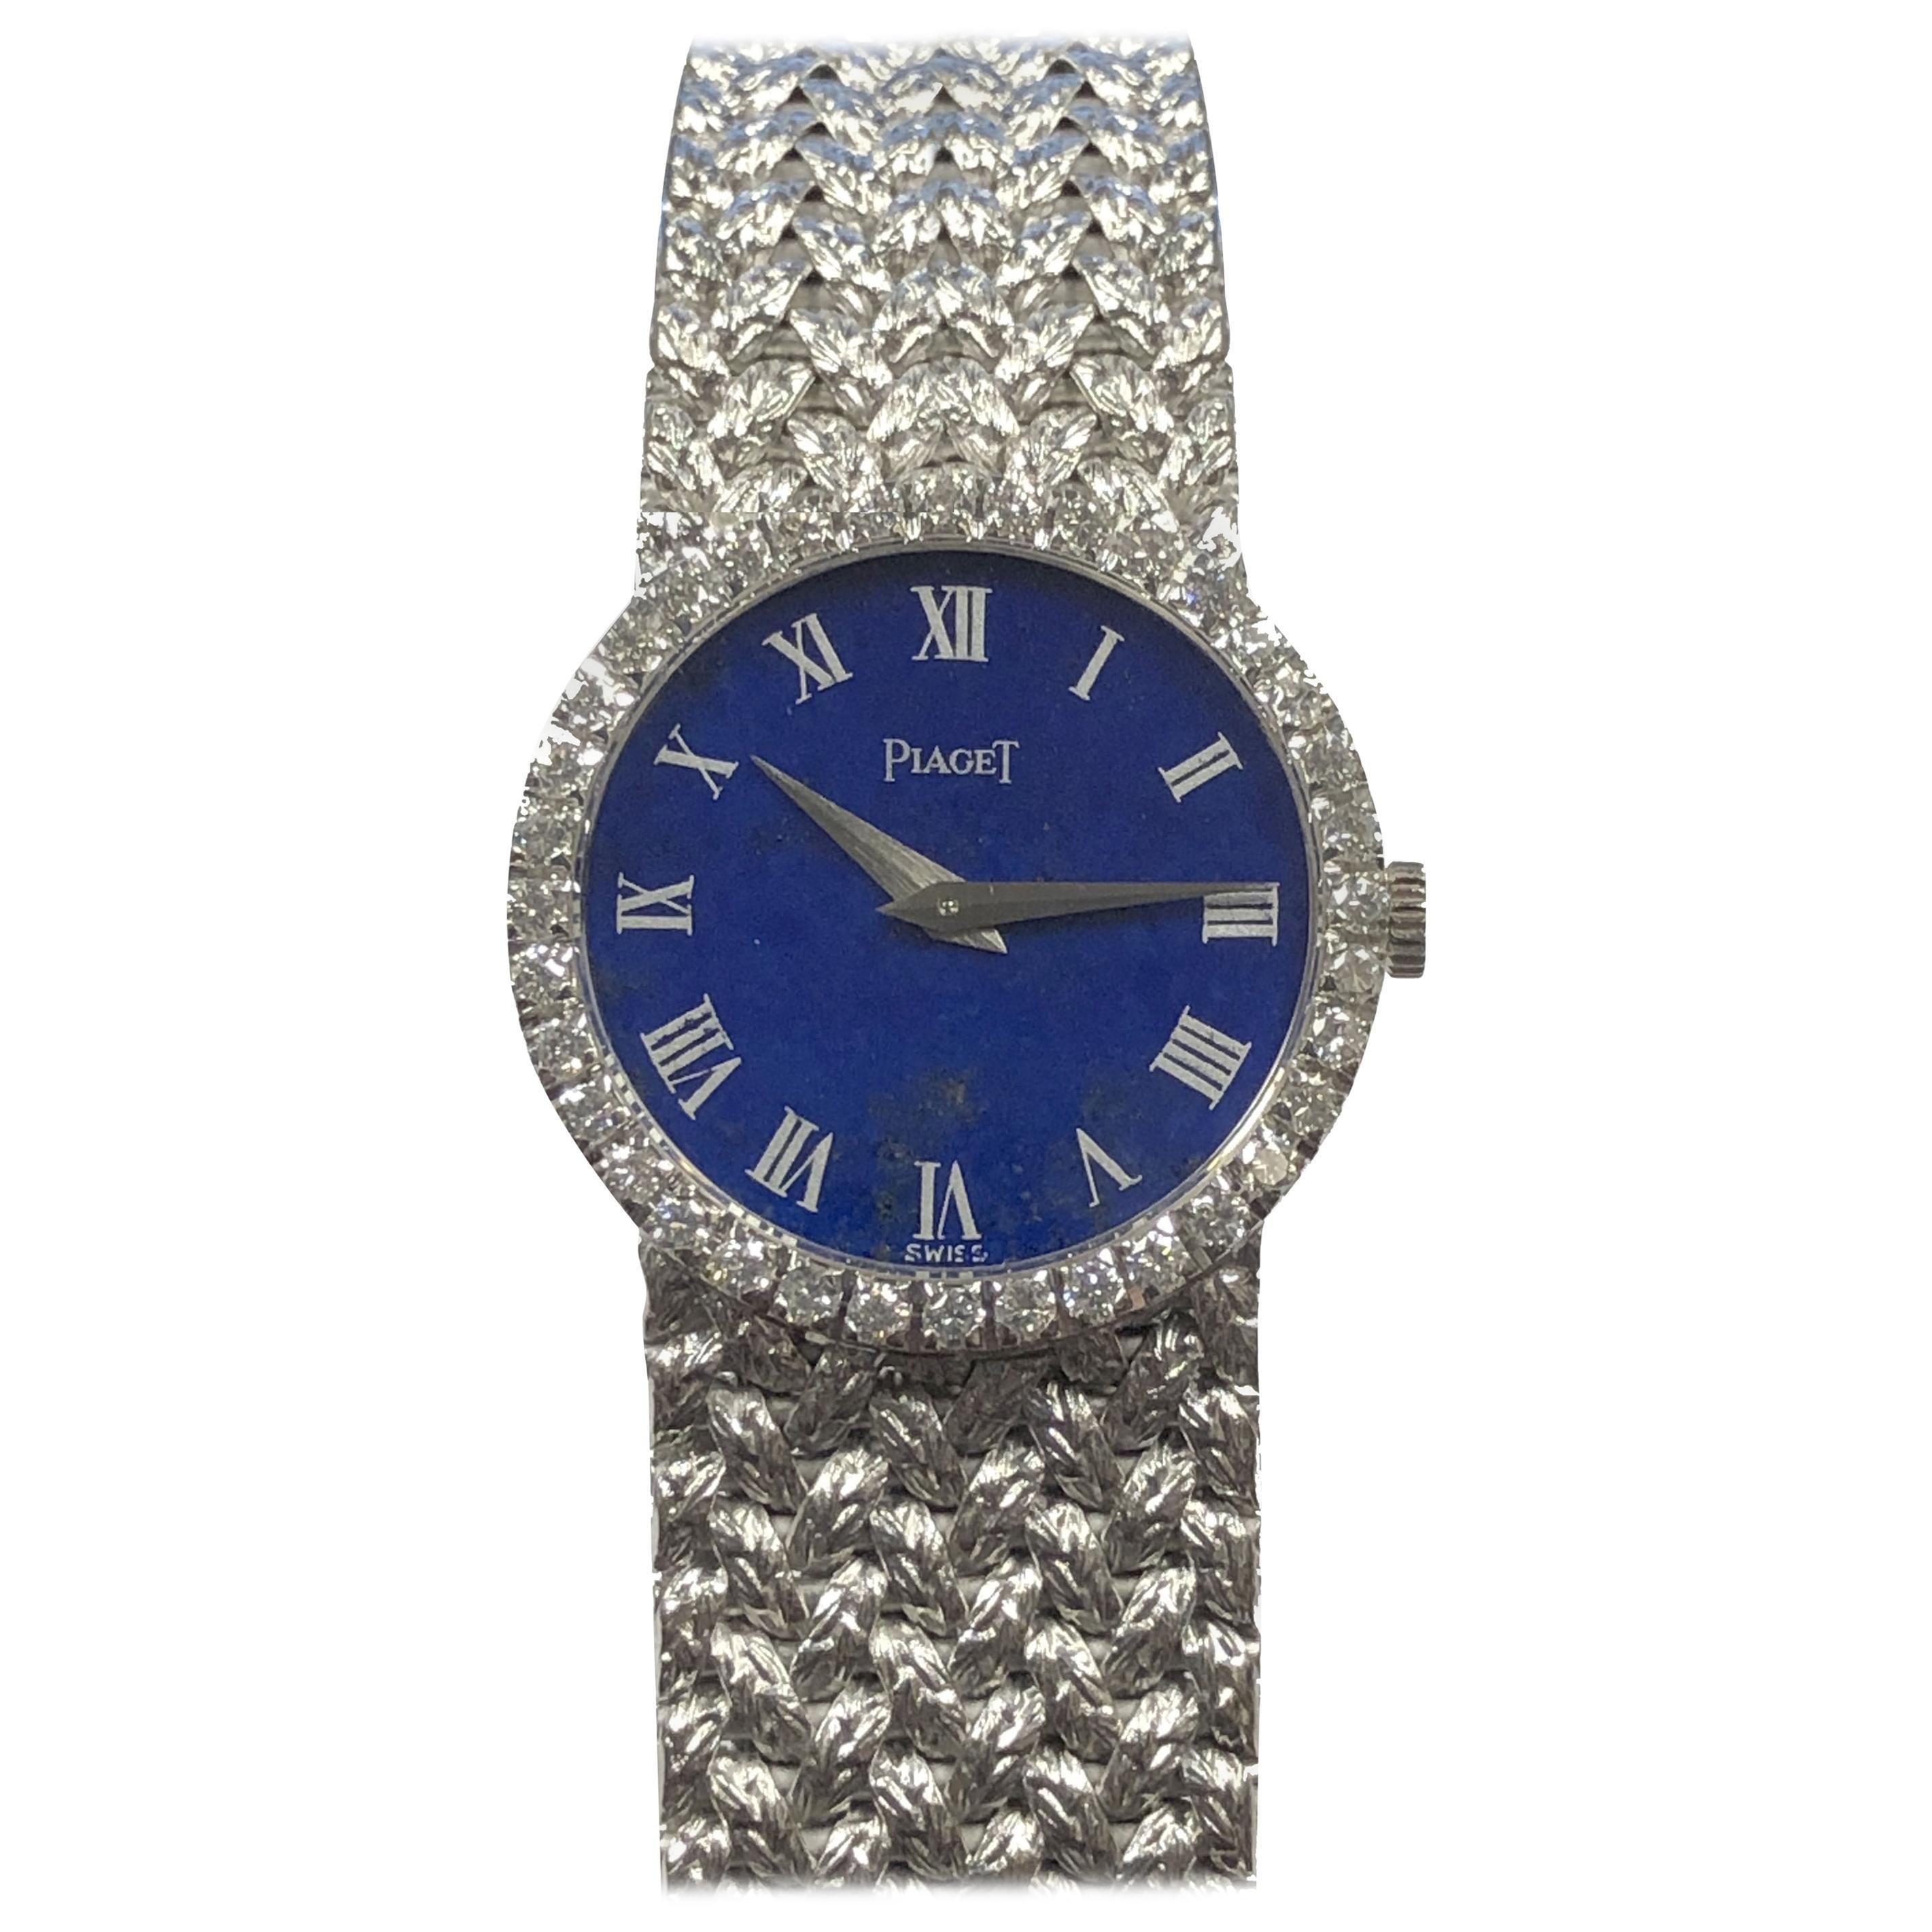 Piaget White Gold Lapis Dial and Diamonds Ladies Mechanical Wrist Watch